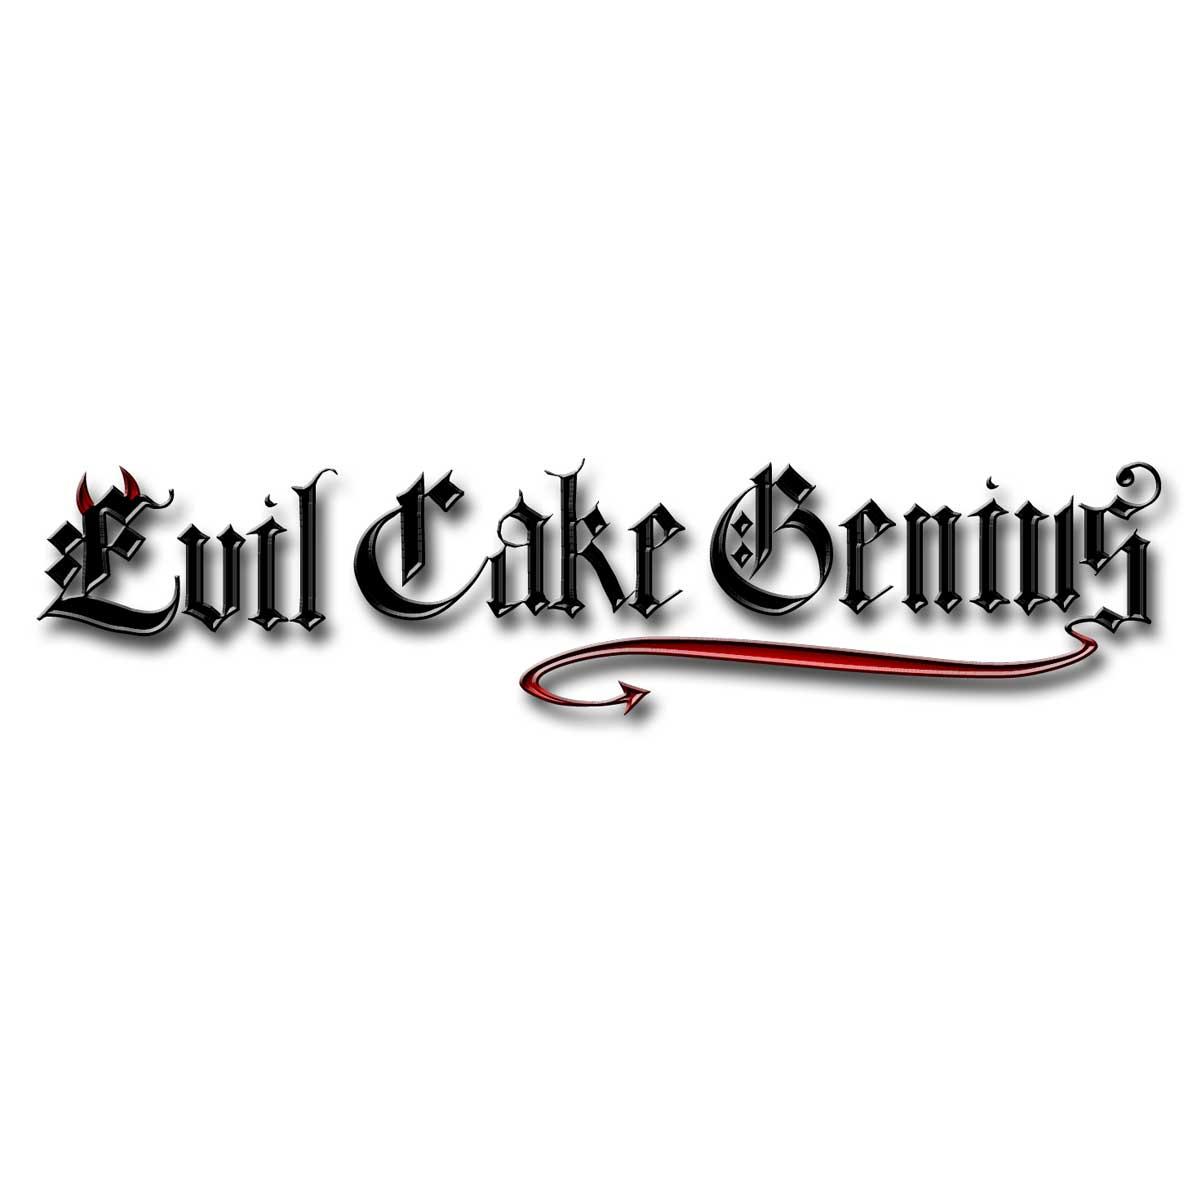 Designer Sprinkles Metallic Gold Mix - Evil Cake Genius